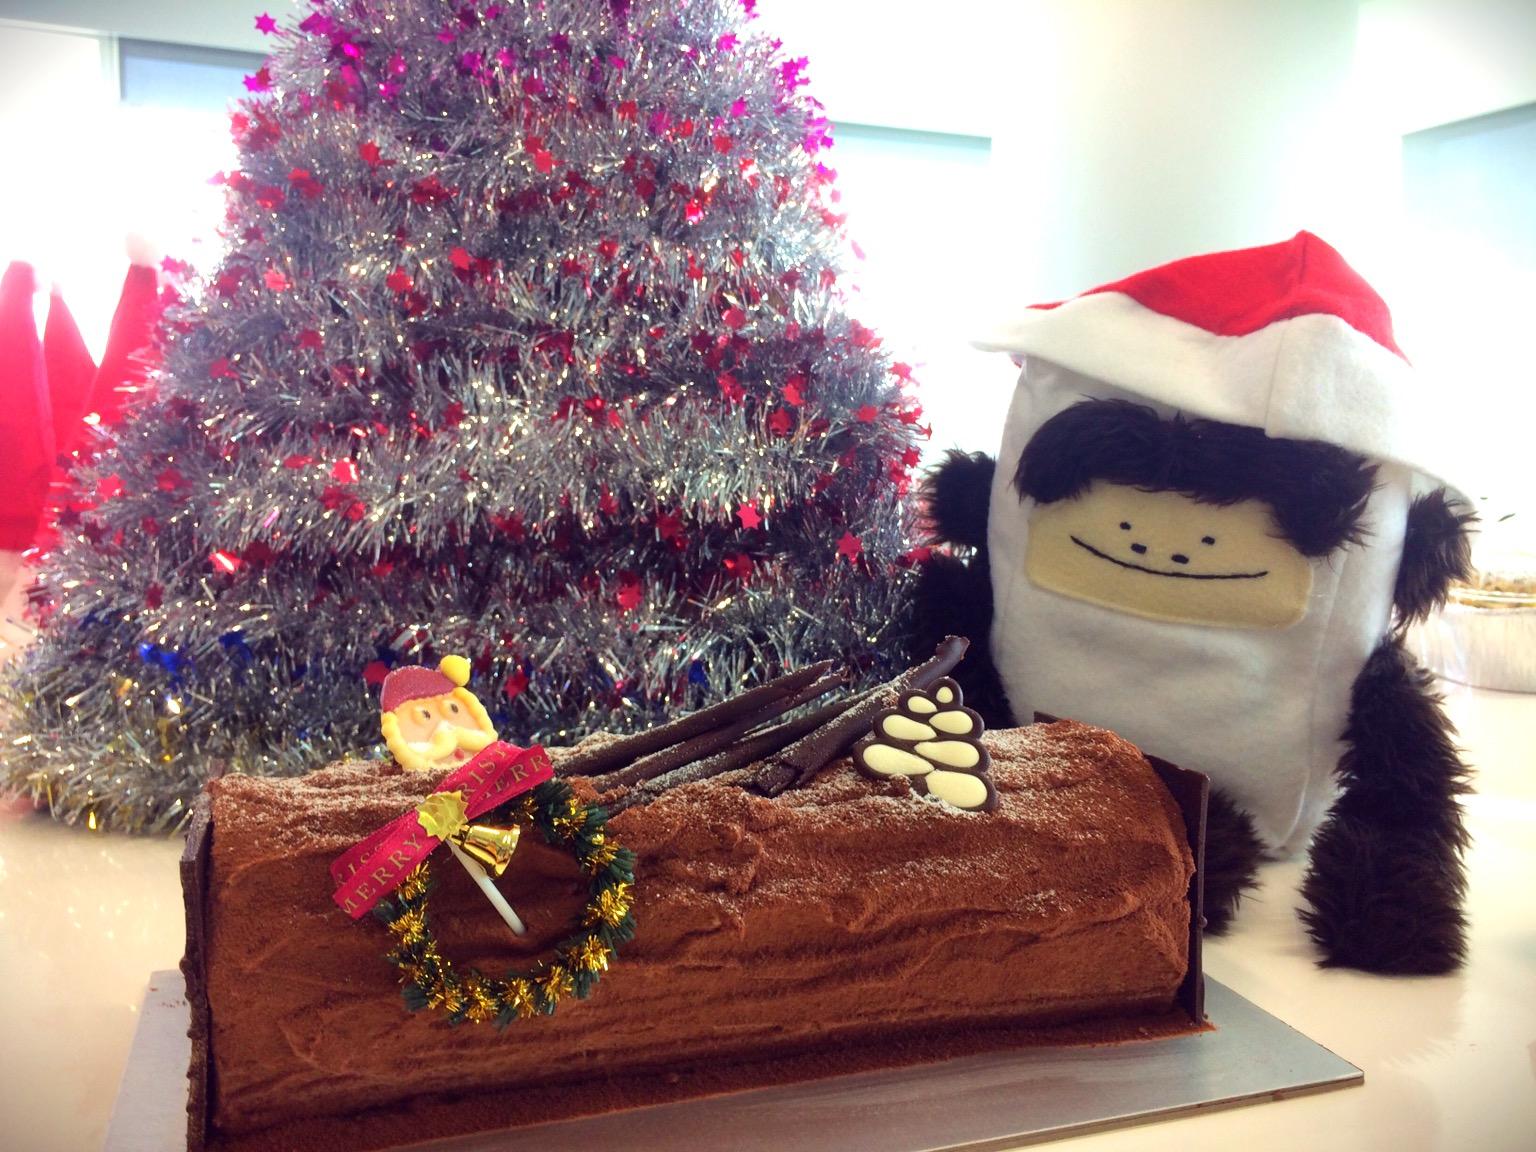 Gor likes log cake